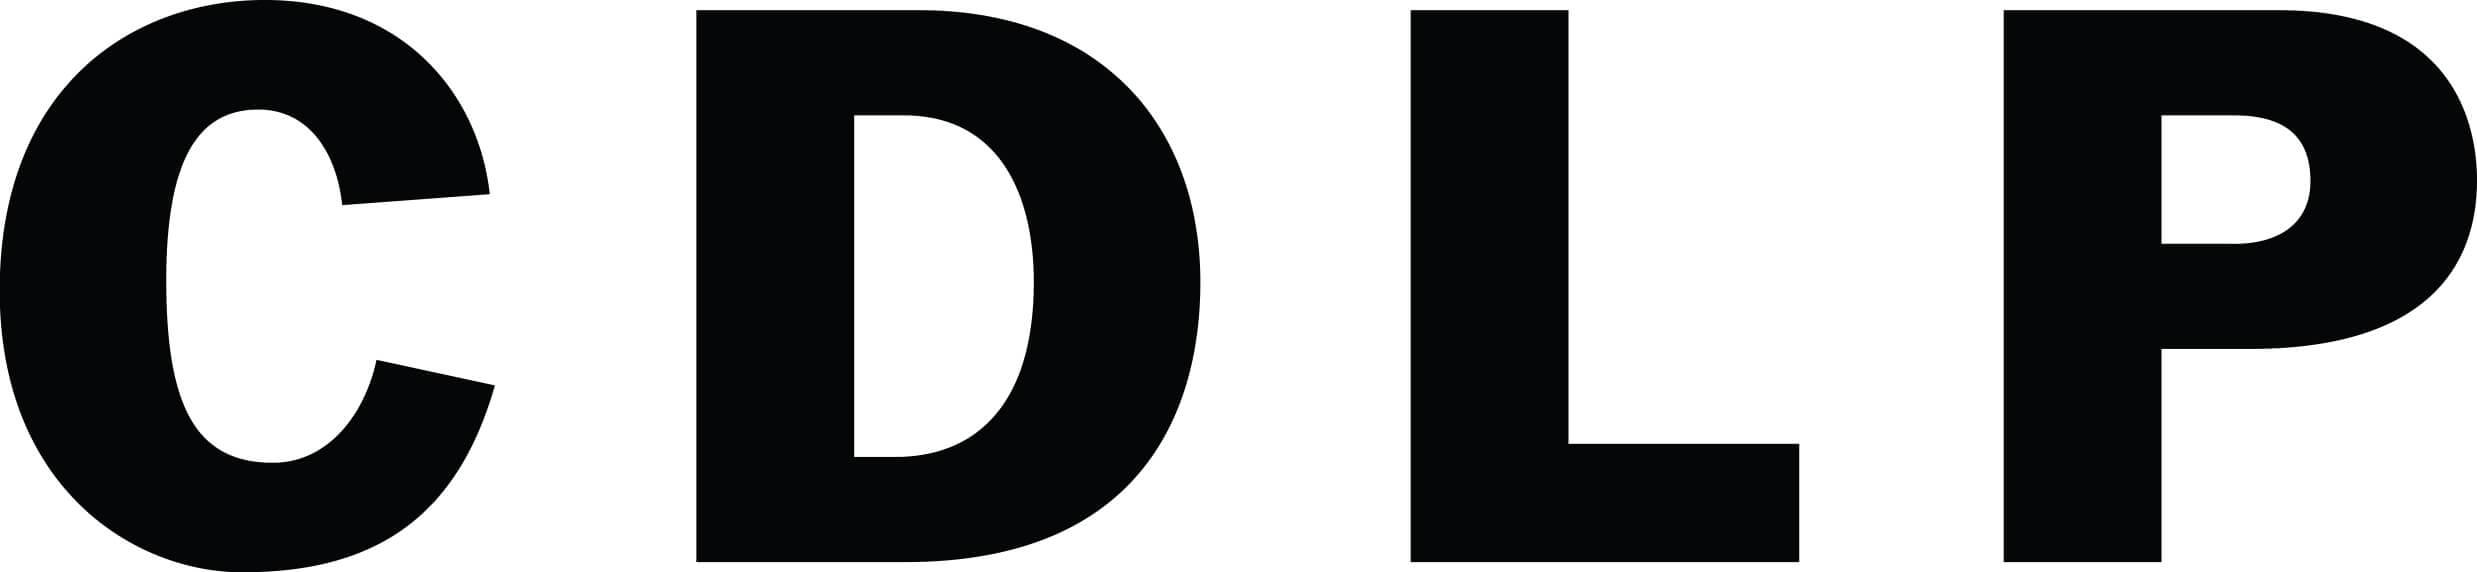 Mustavalkoinen c d p l logo